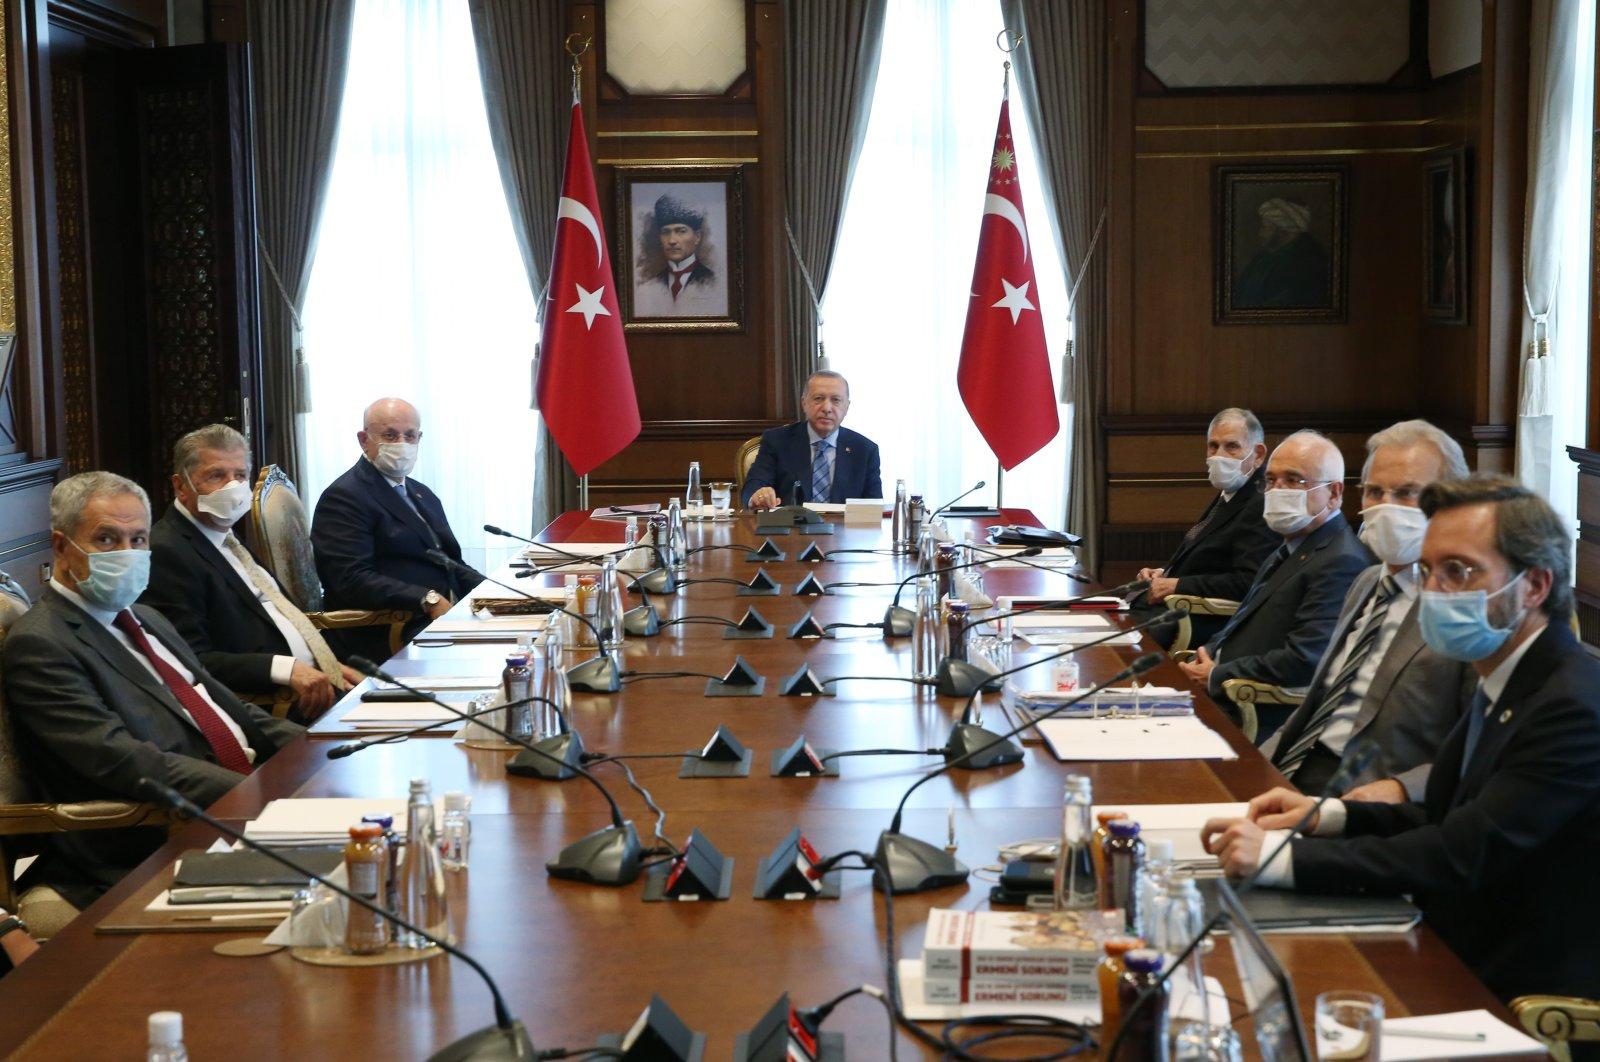 President Recep Tayyip Erdoğan heads a High Advisory Board meeting at the Presidential Complex in Ankara, June 16, 2020. (AA Photo)